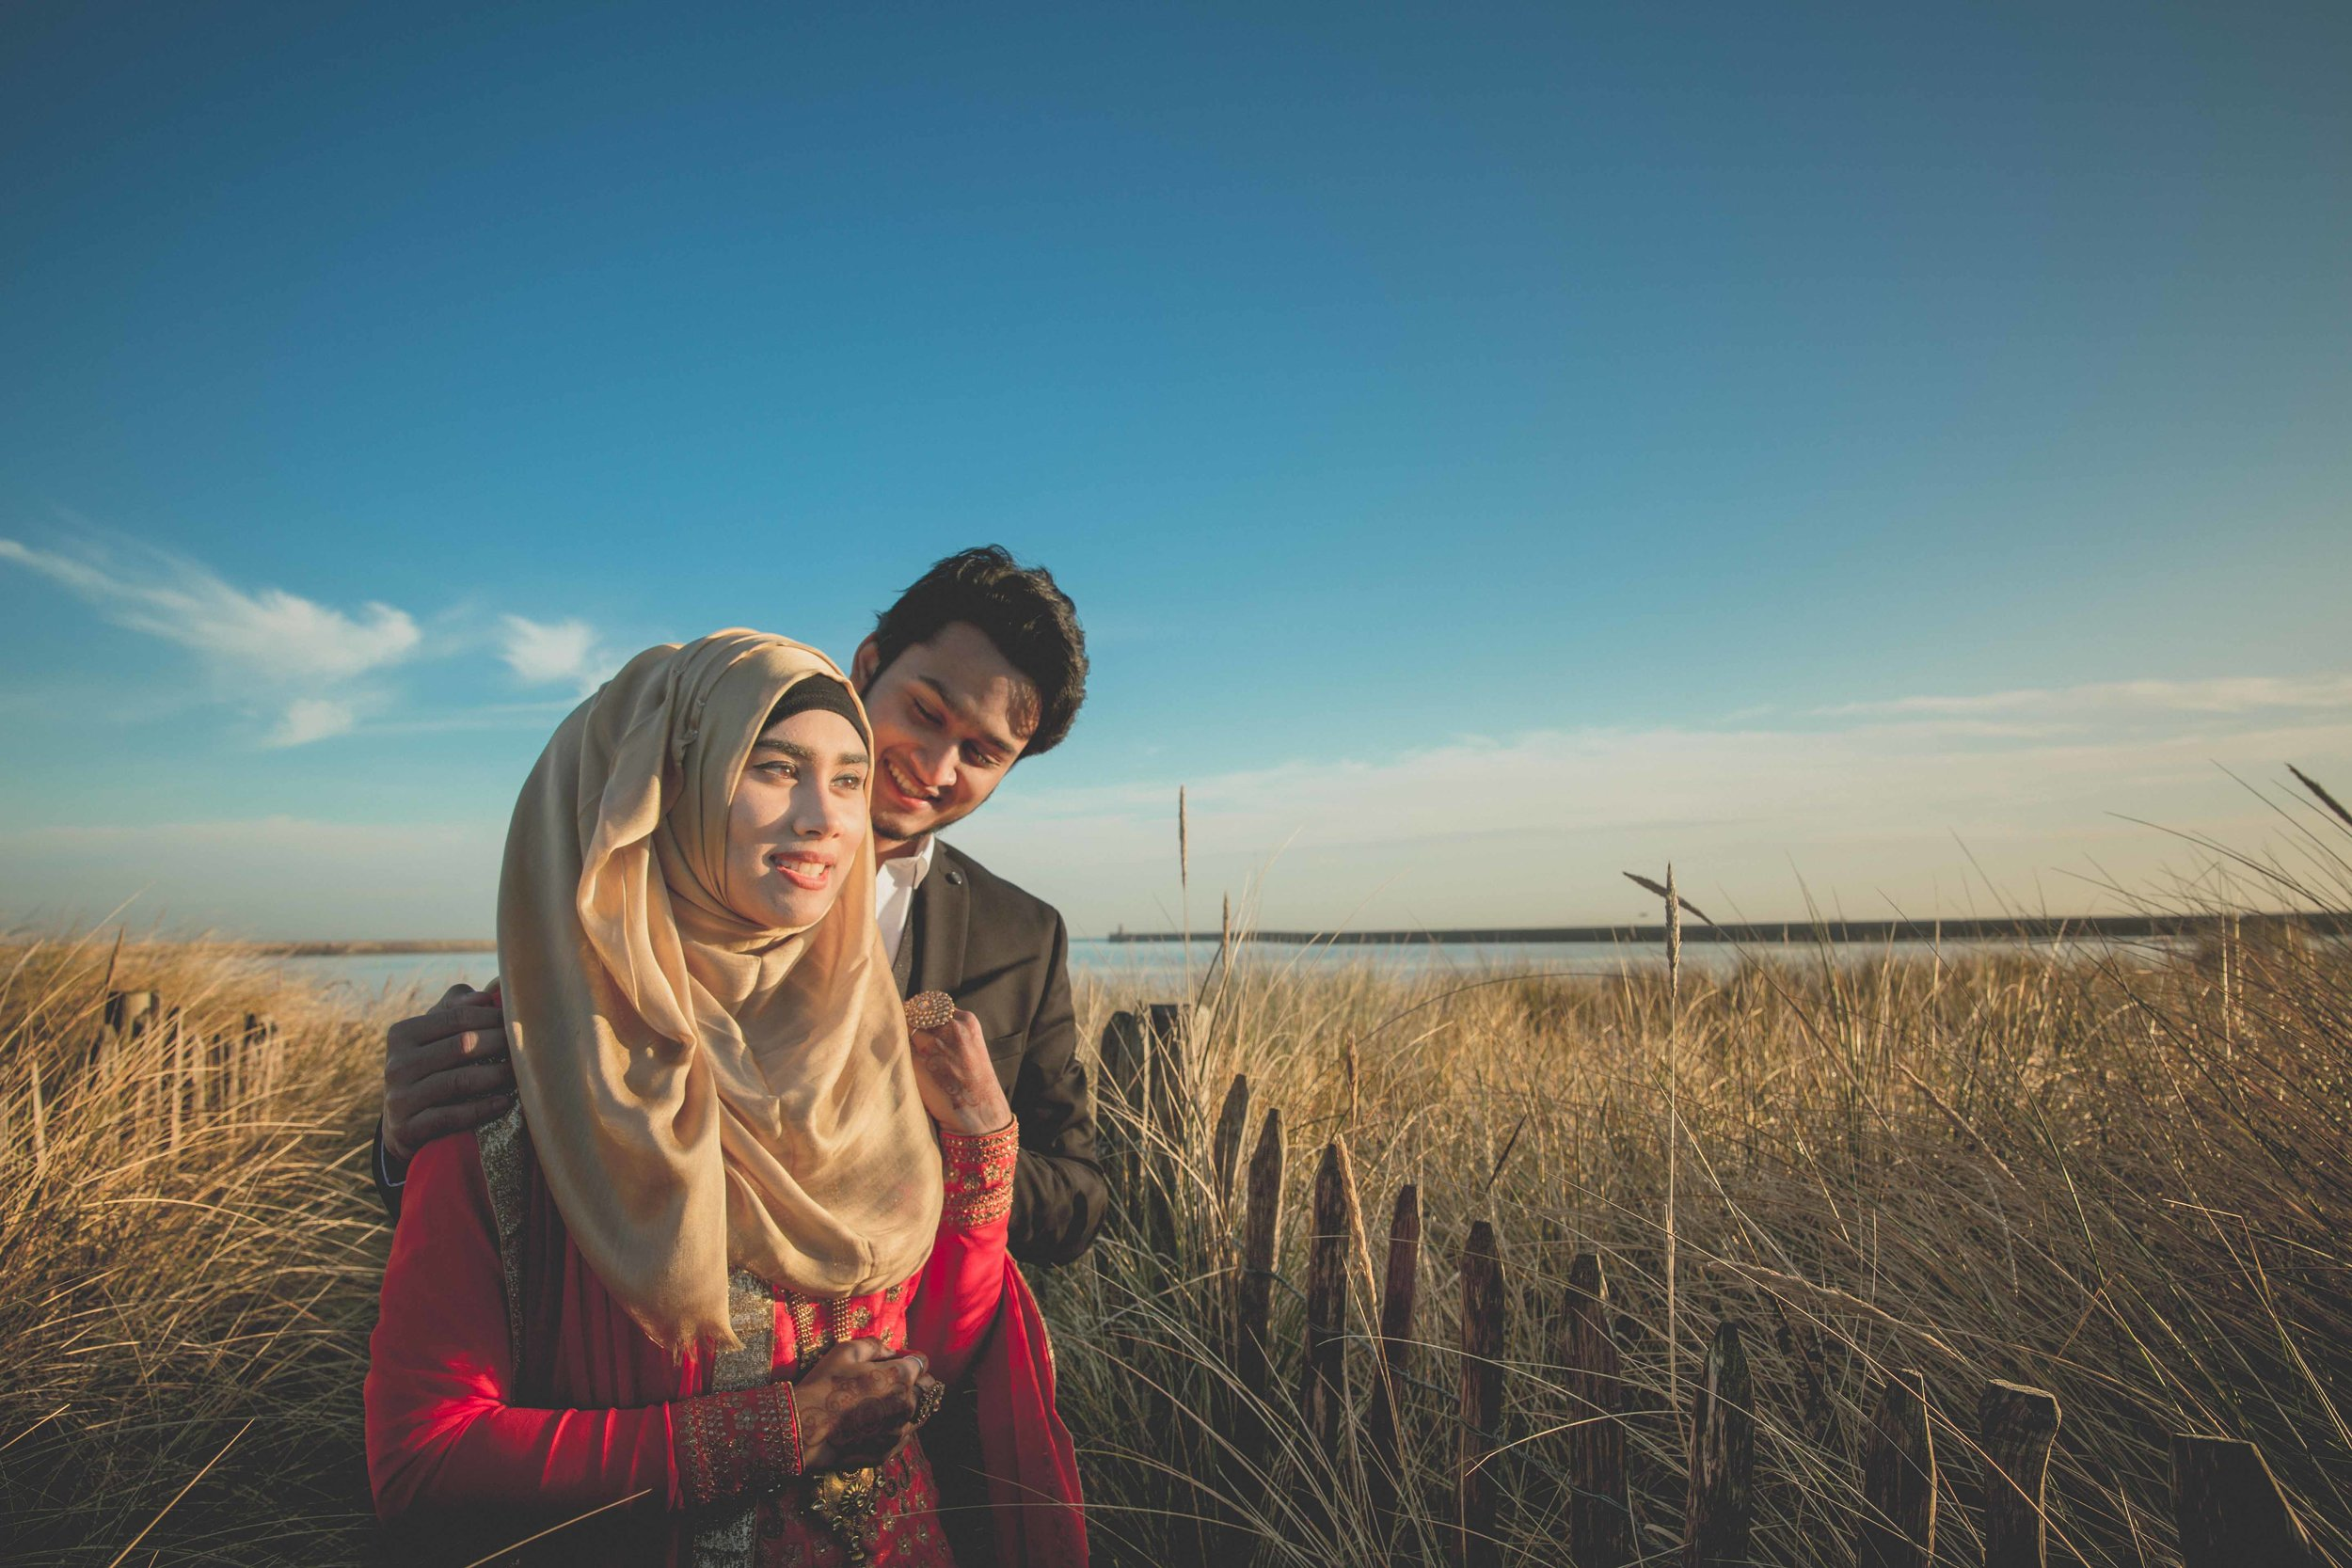 newcastle-beach-lighthouse-couple-prewedding-pre-wedding-shoot-asian-wedding-photographer-natalia-smith-photography-4.jpg